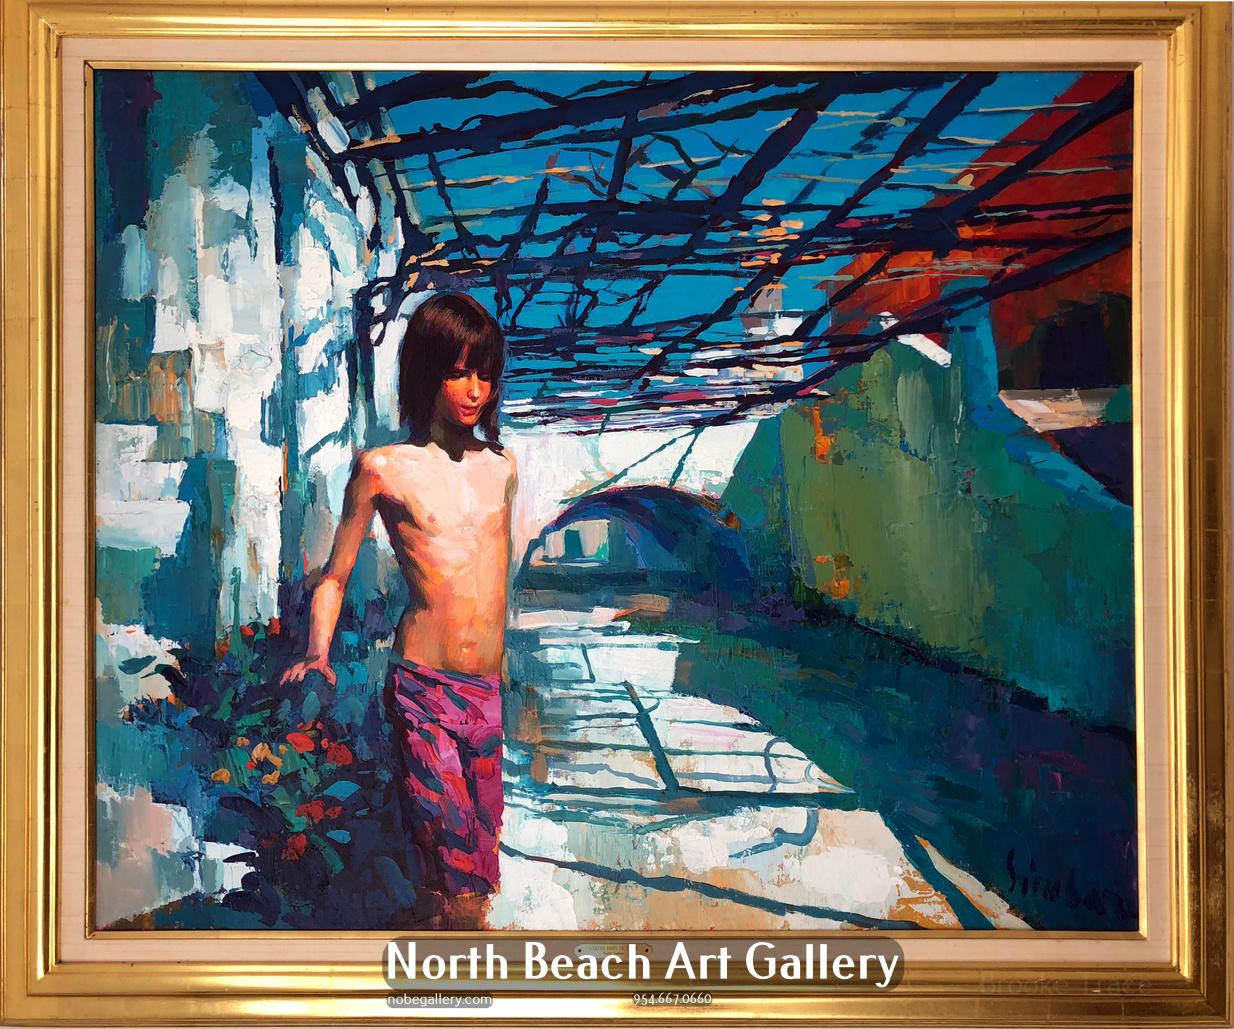 North Beach Art Gallery image 6